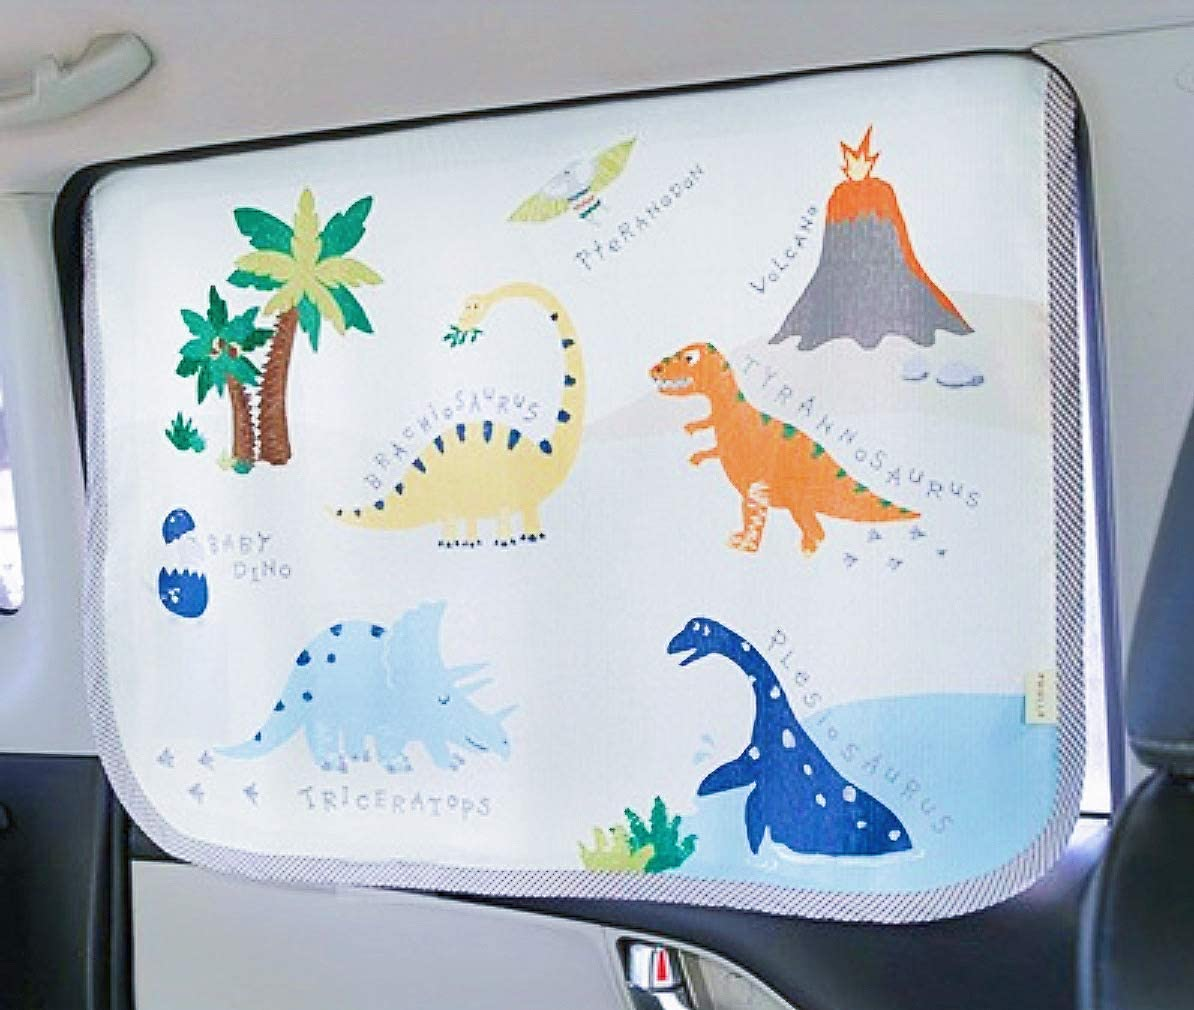 White Giraffe Litto Kiddo Car Sun Shade Curtain Magnetic Window Cover for Baby Kids Children Sunshade Protector Protects from Sun Heat Blocks UV Rays Glare Car Interior Sun Blocker Blind